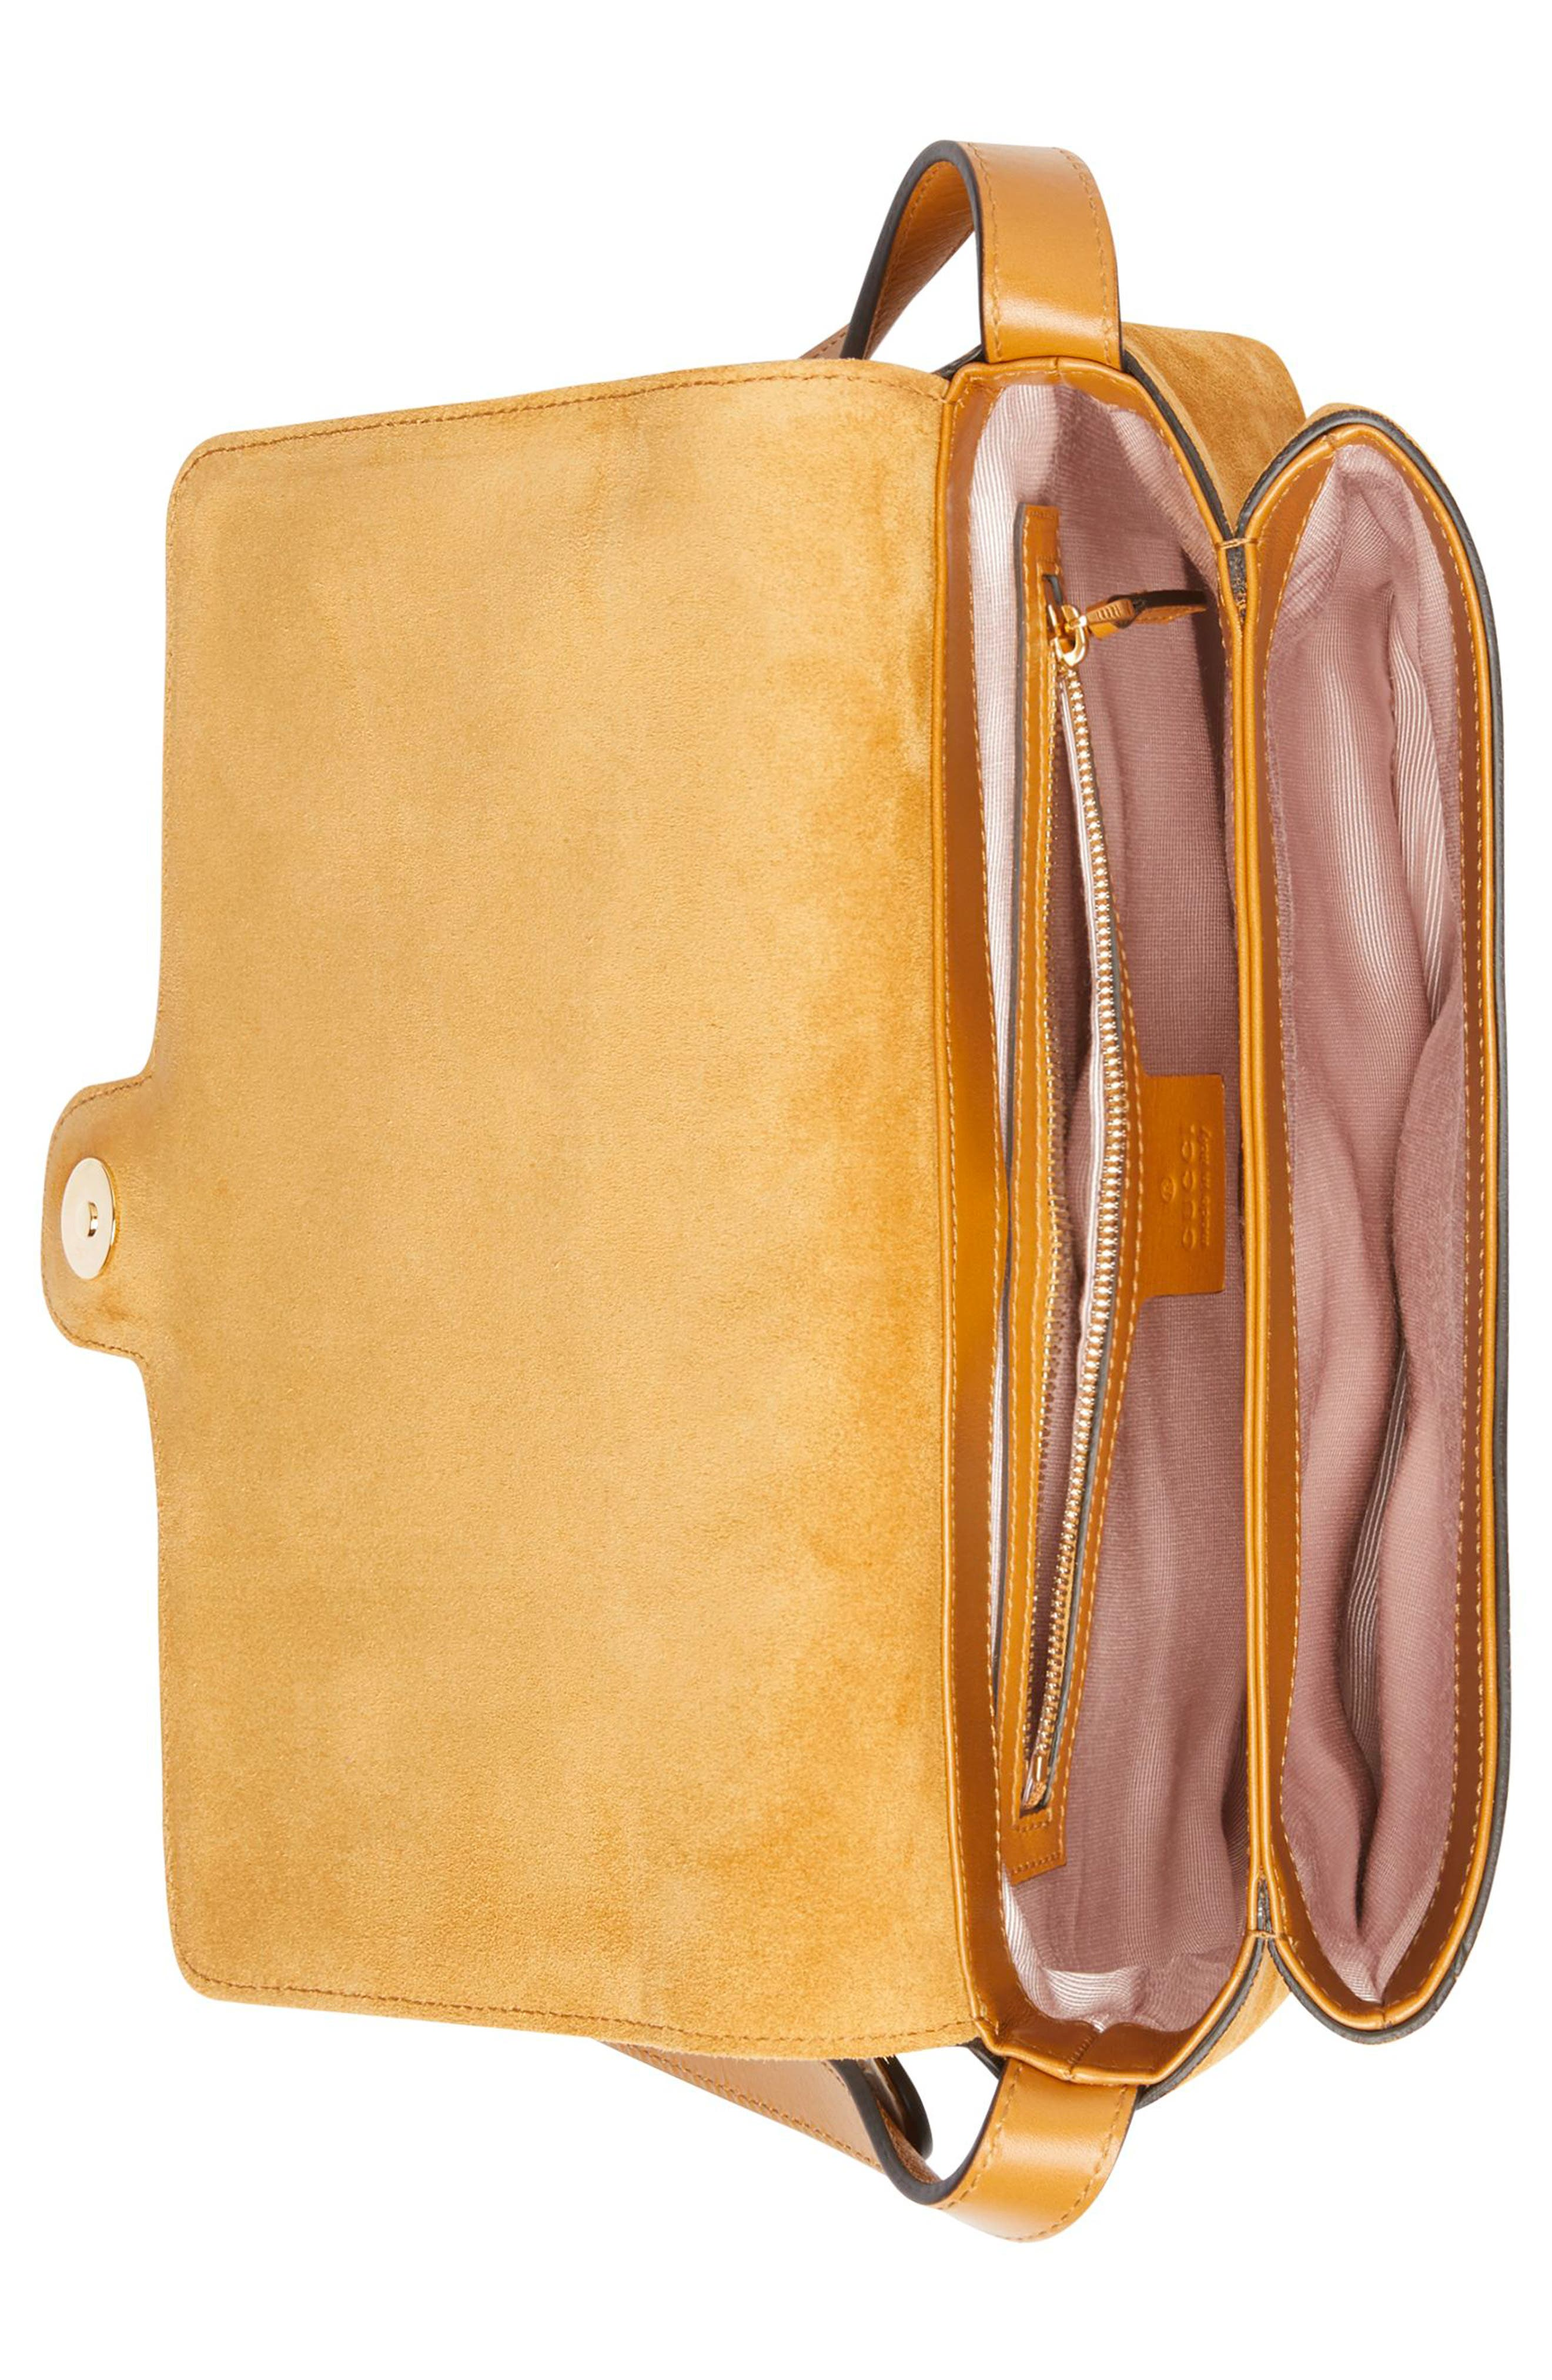 Medium Arli Shoulder Bag,                             Alternate thumbnail 3, color,                             LIGHT COGNAC